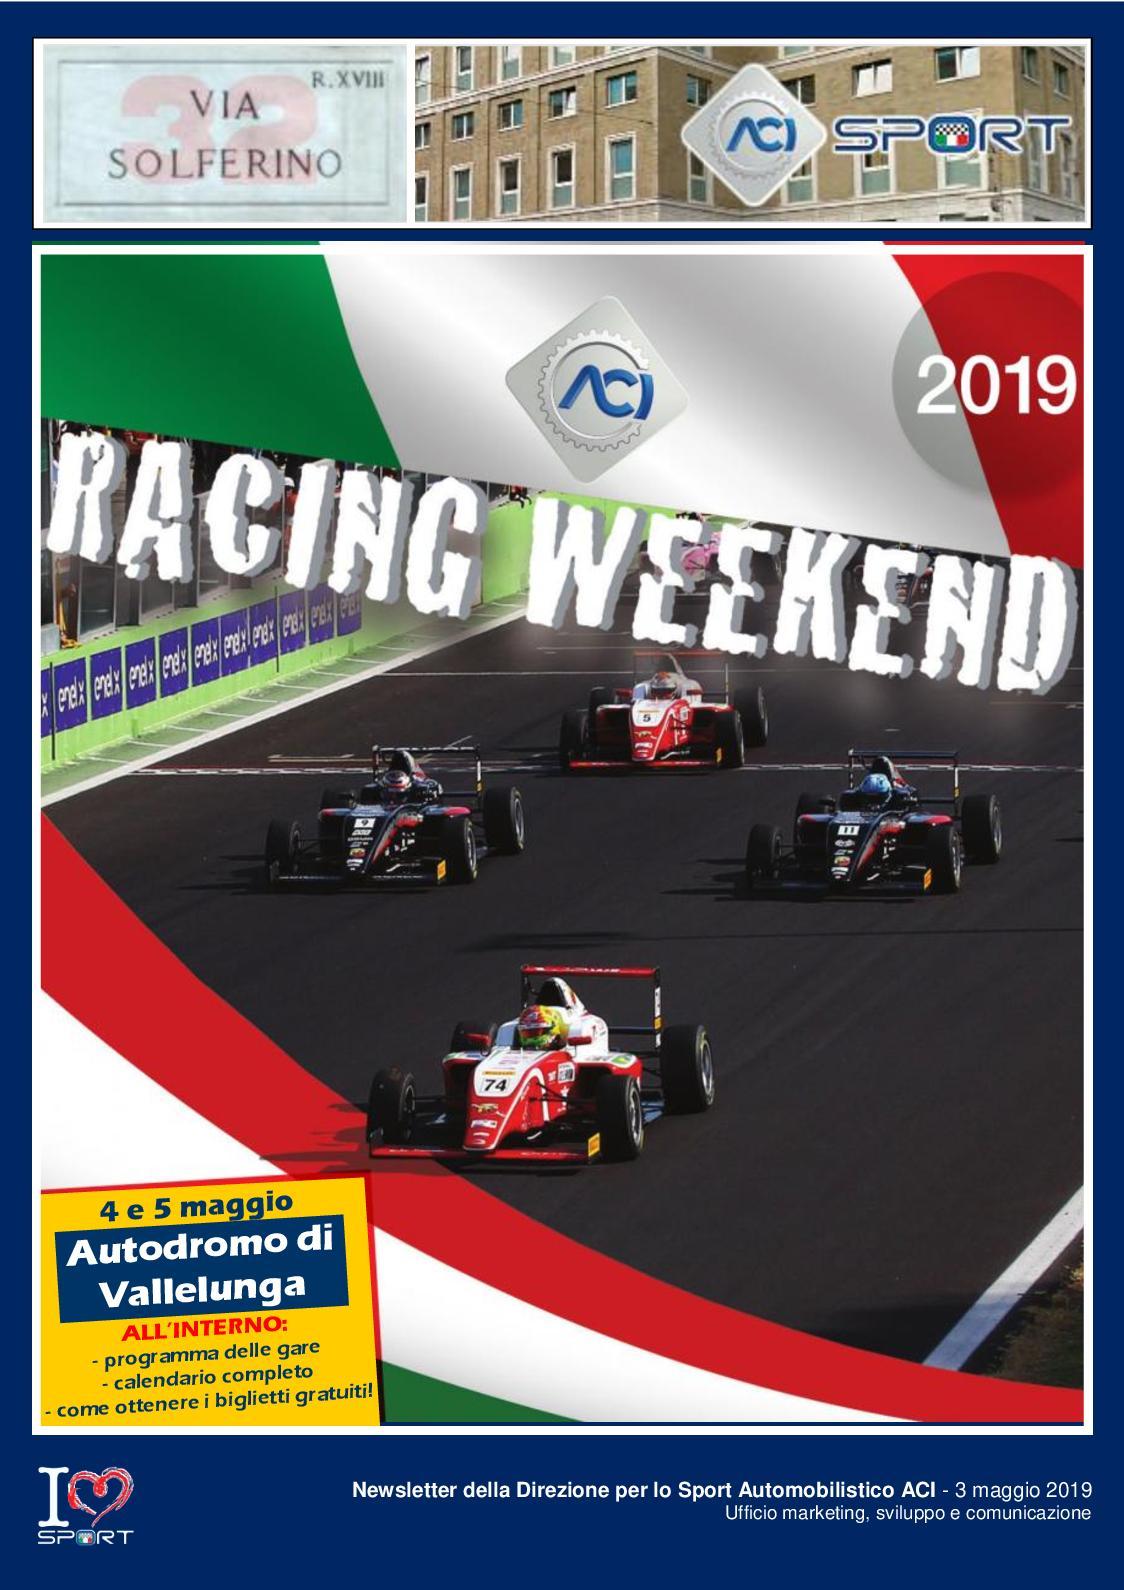 Aci Sport Calendario.Calameo Viasolferino32 Maggio 2019